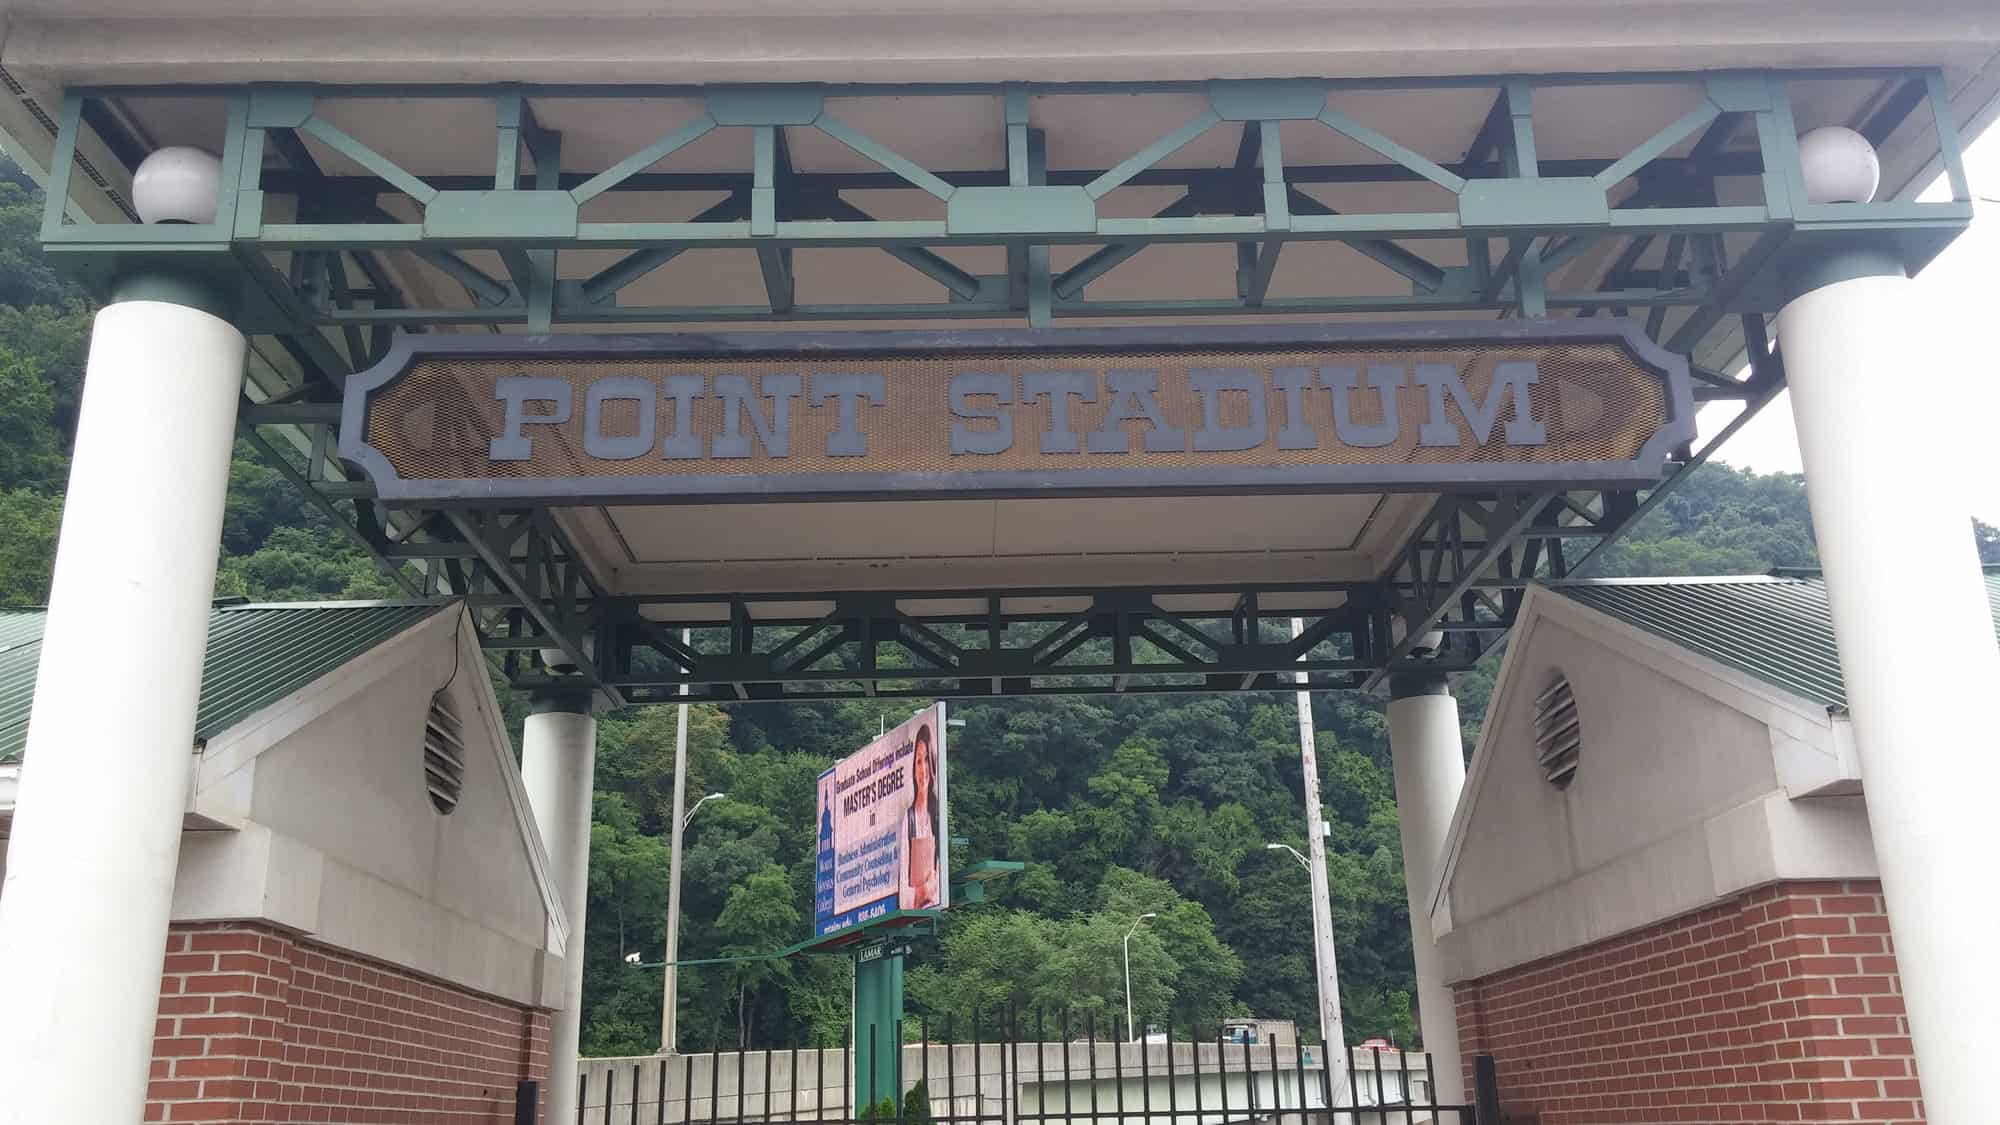 Point Stadium entrance